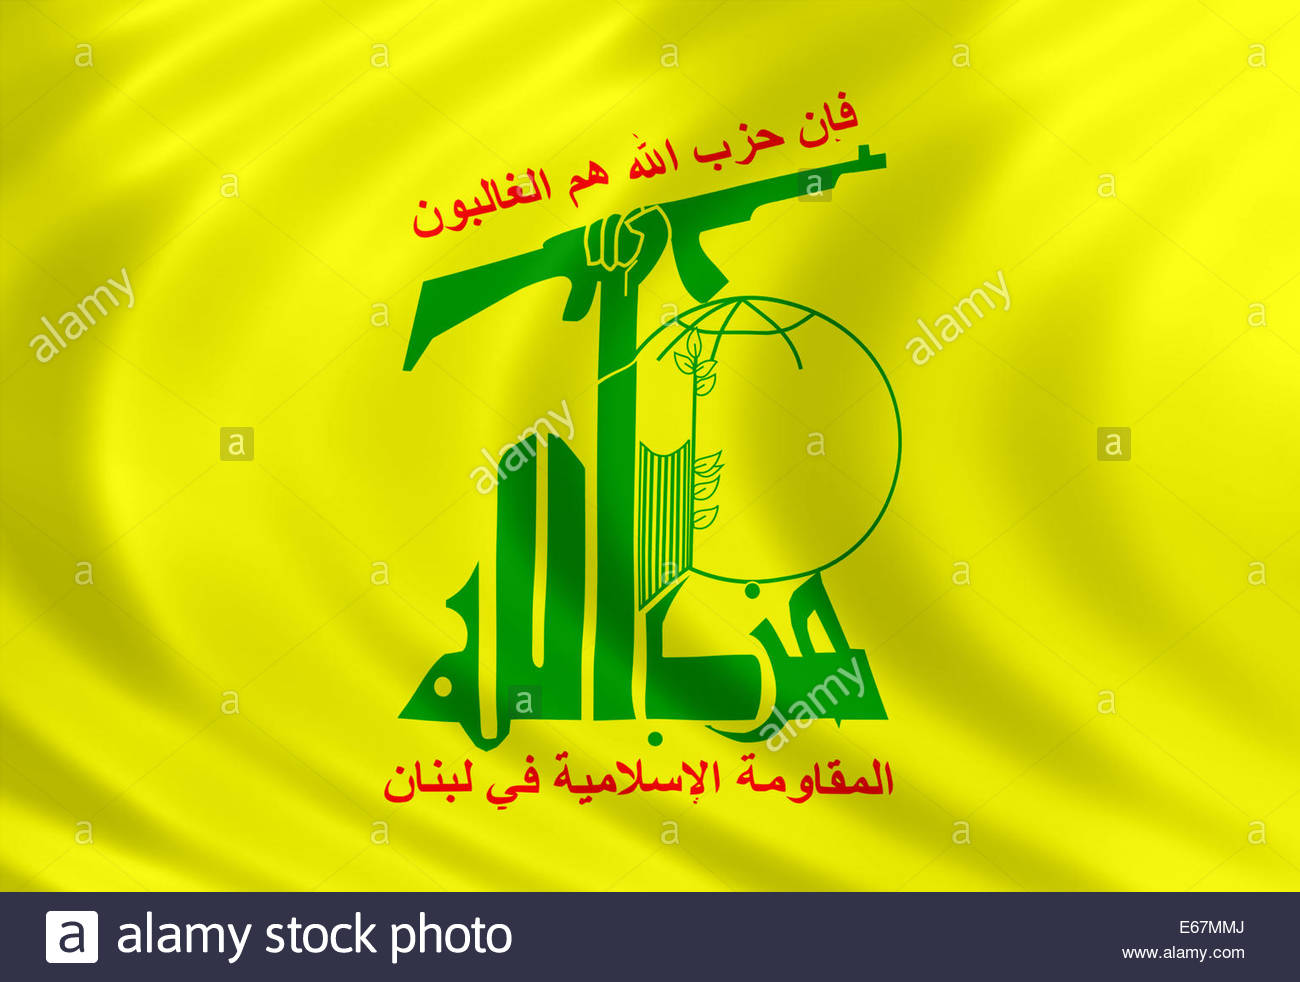 Hezbollah Hizbullah Hizballah icon logo with flag of silk - Stock Image